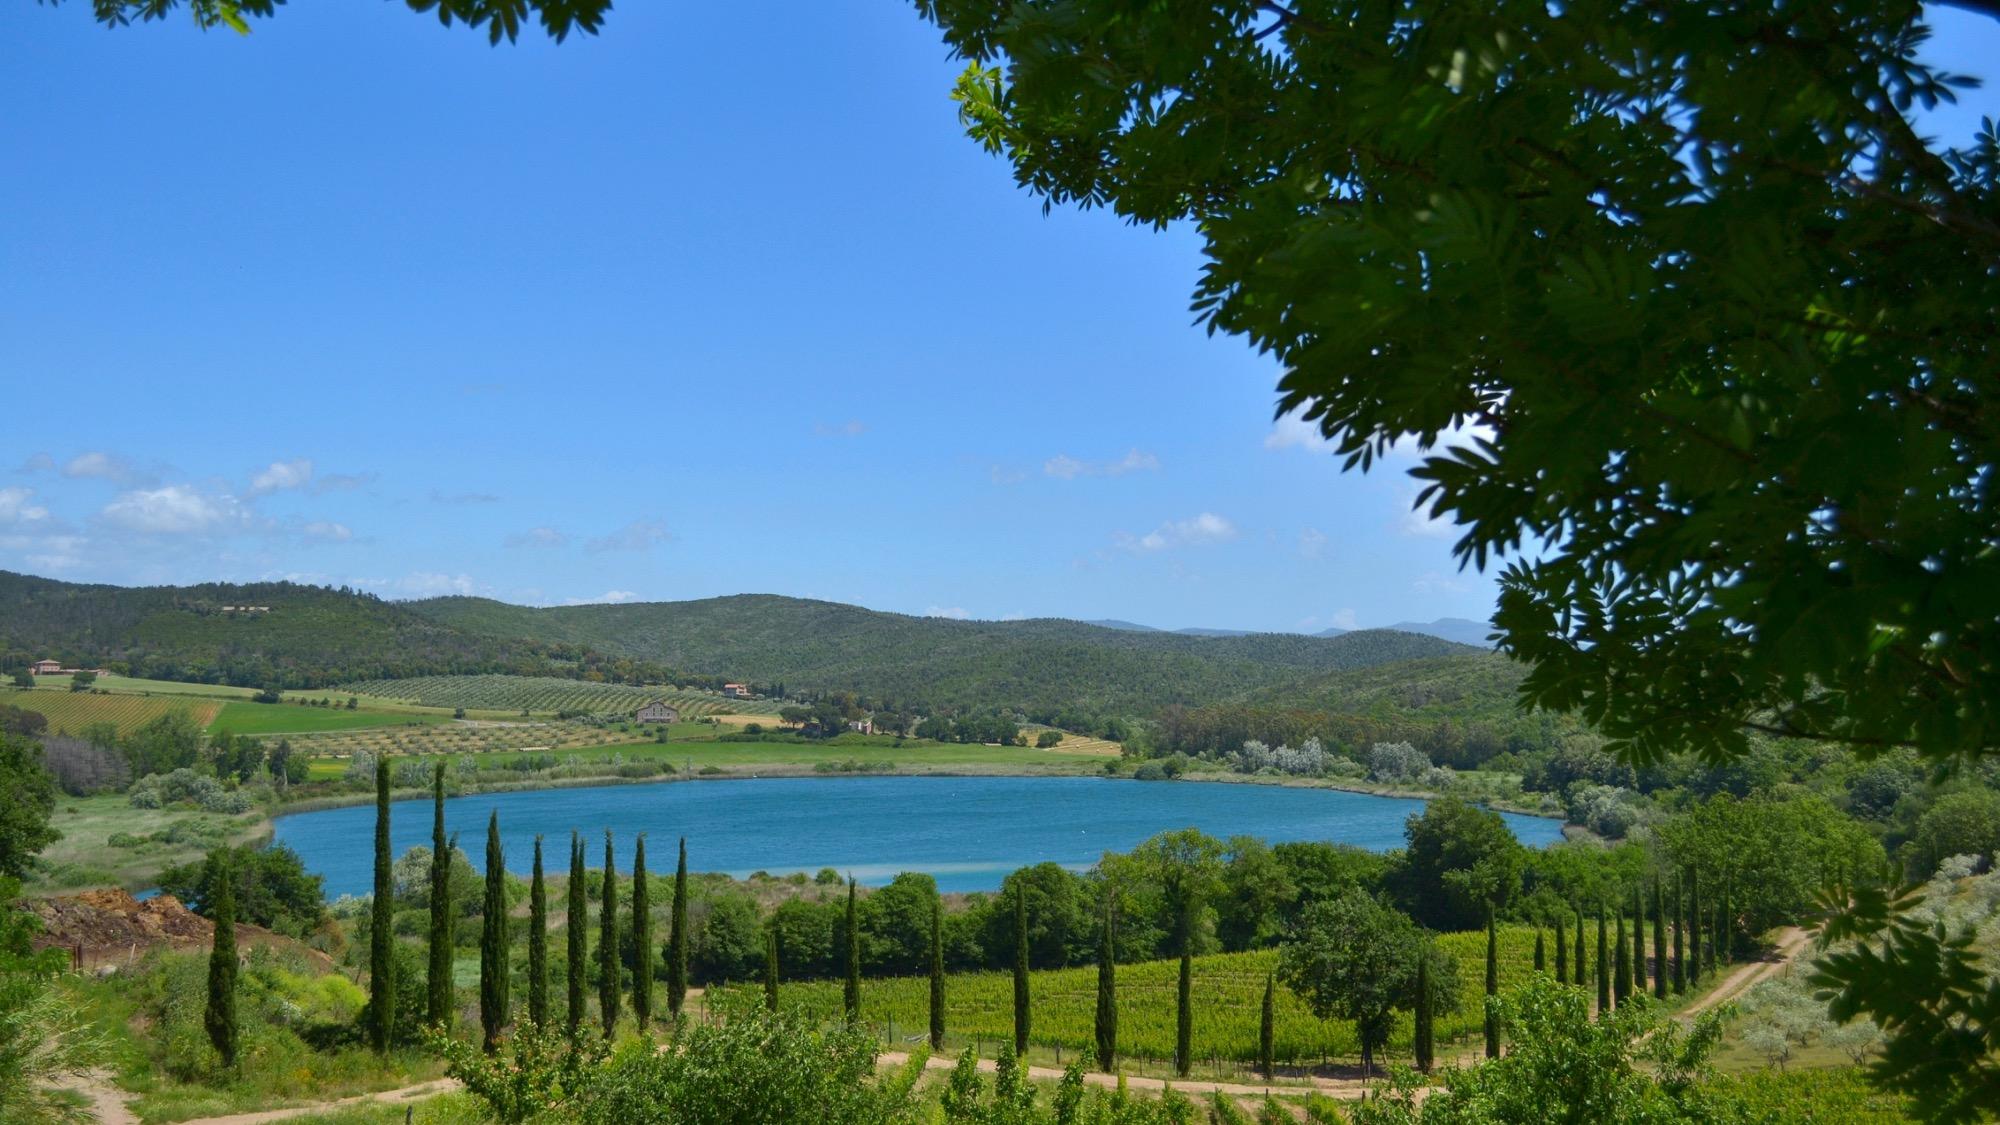 Lago dell'Accesa (Gr) – Toscana